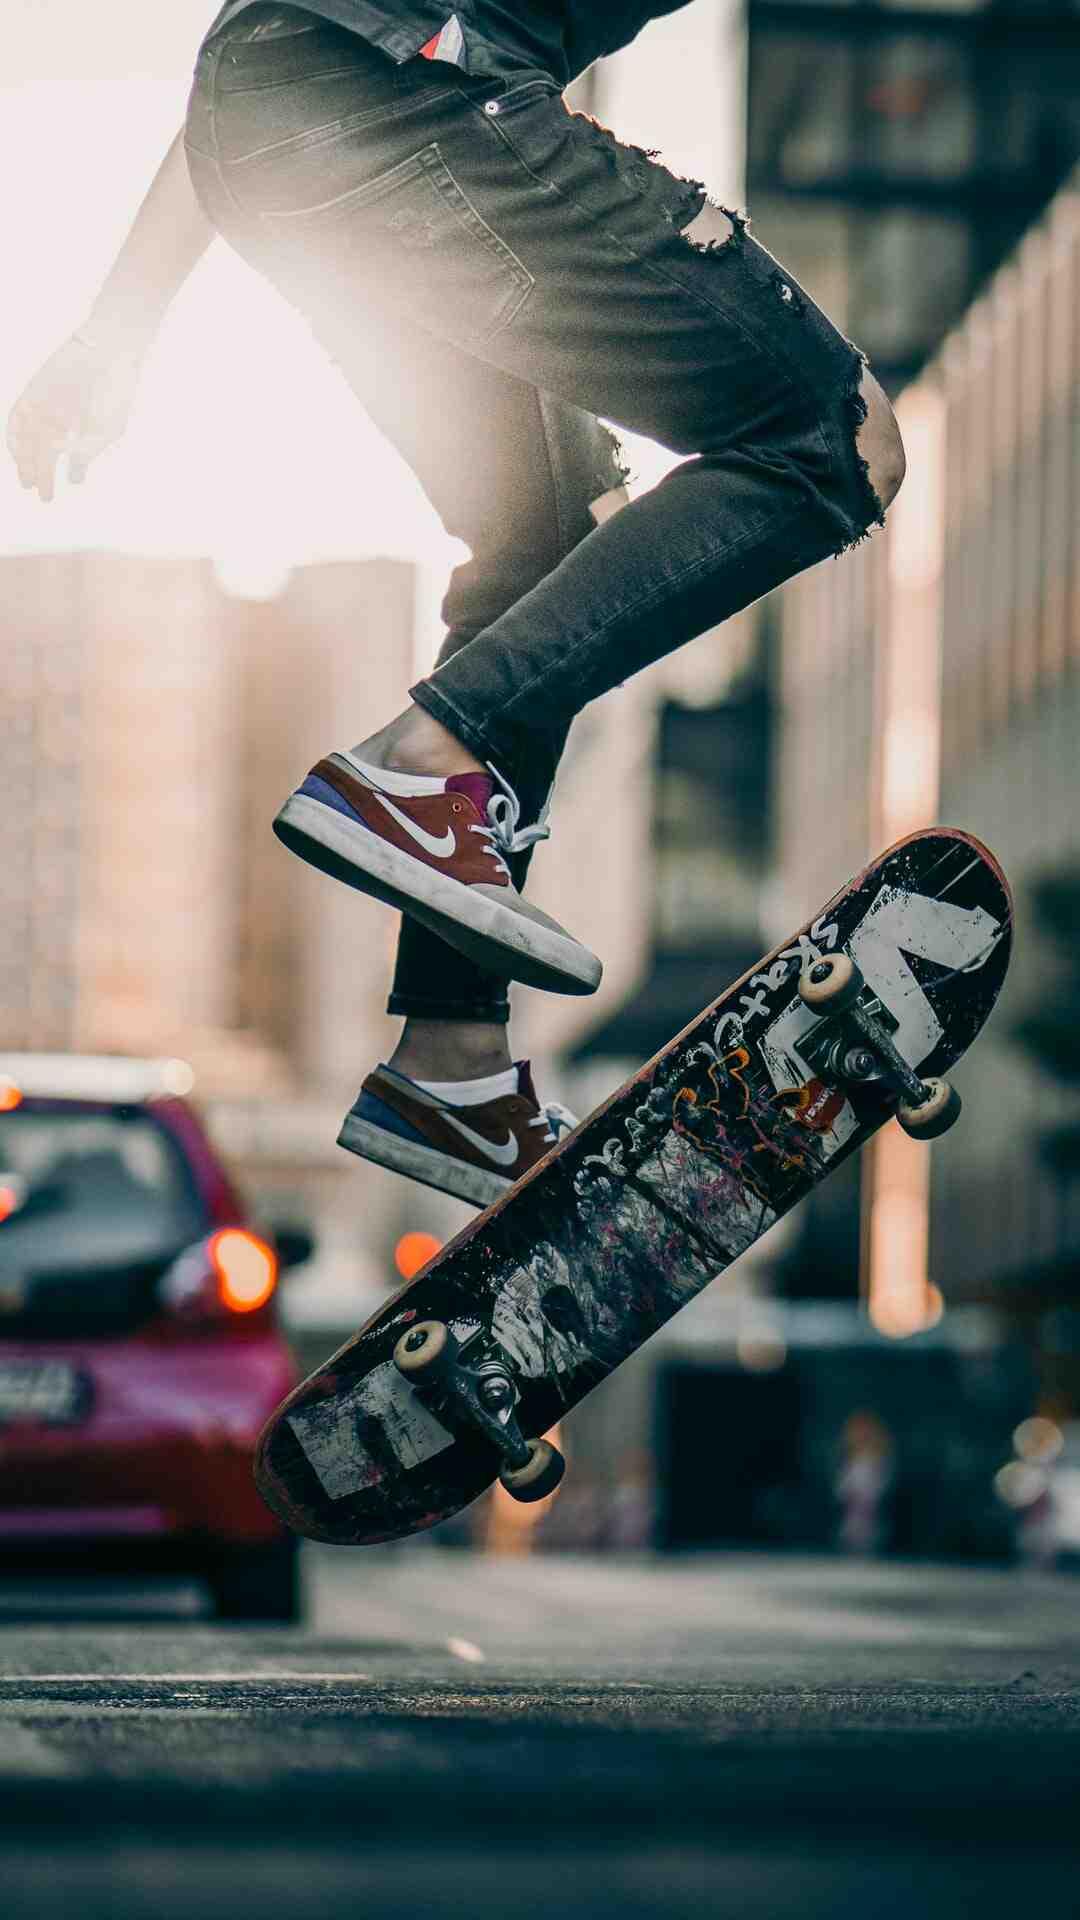 Comment sauter en skateboard